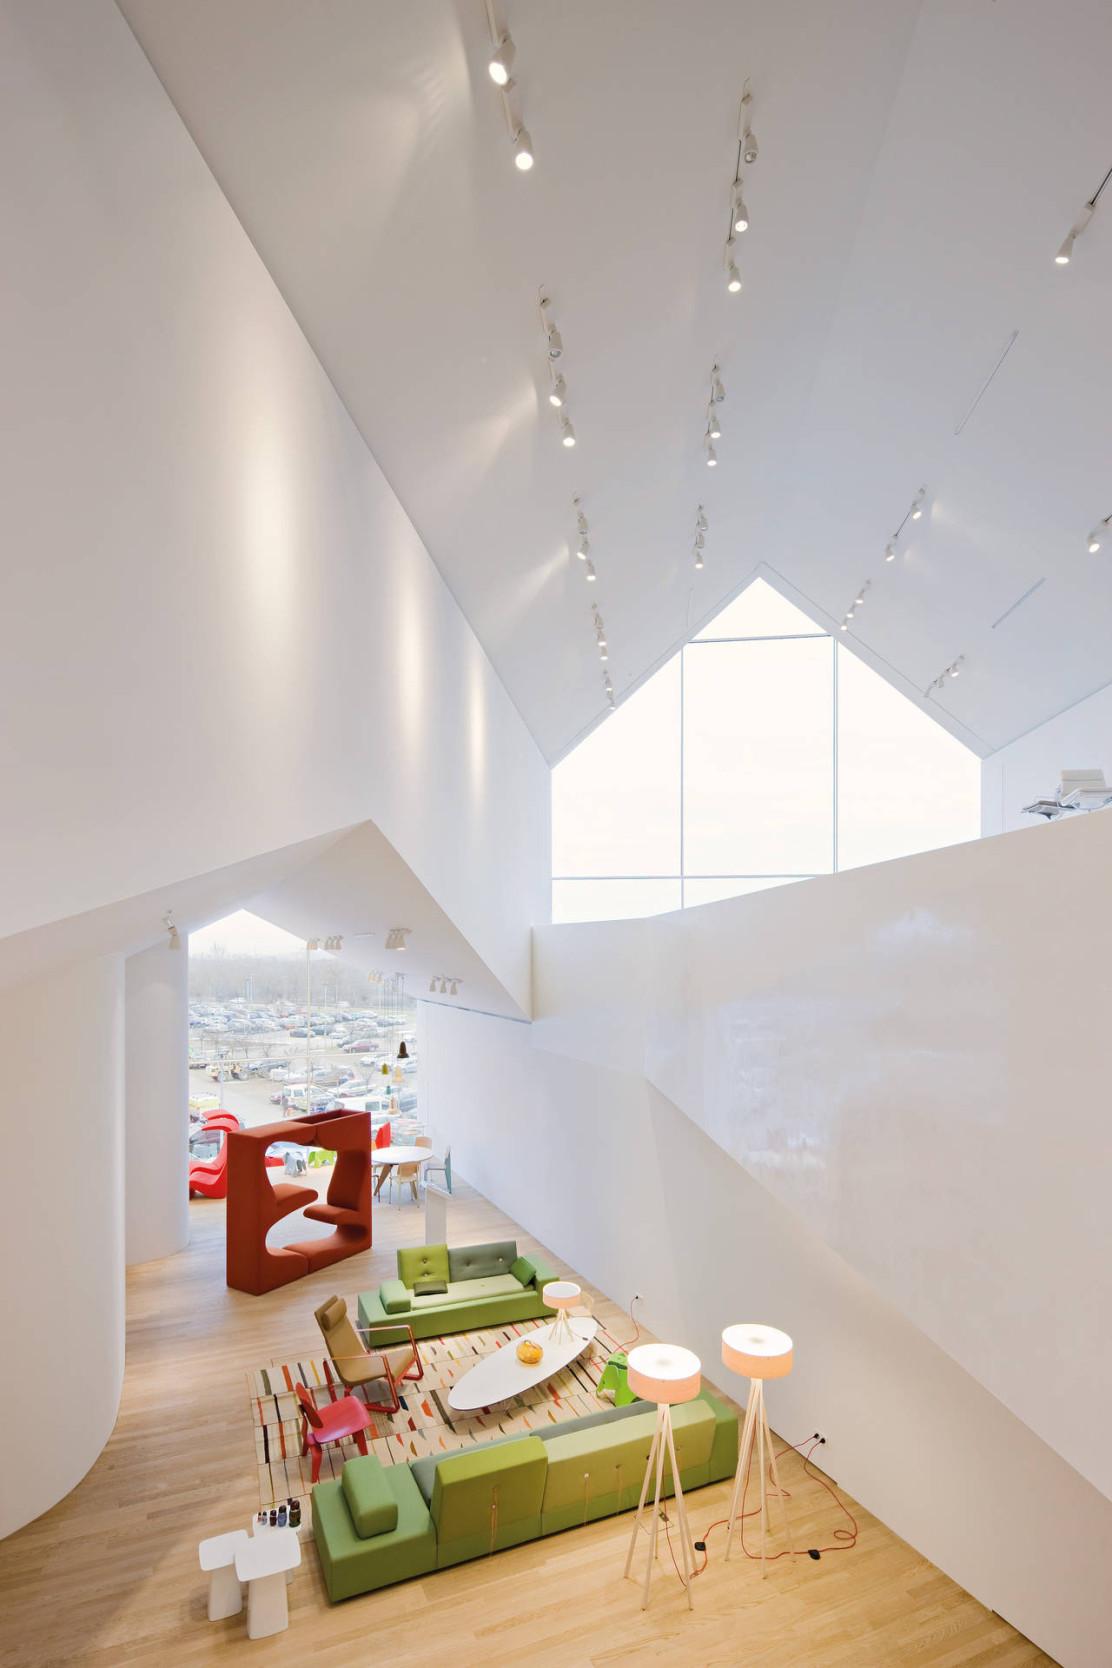 vitra museum area. Black Bedroom Furniture Sets. Home Design Ideas